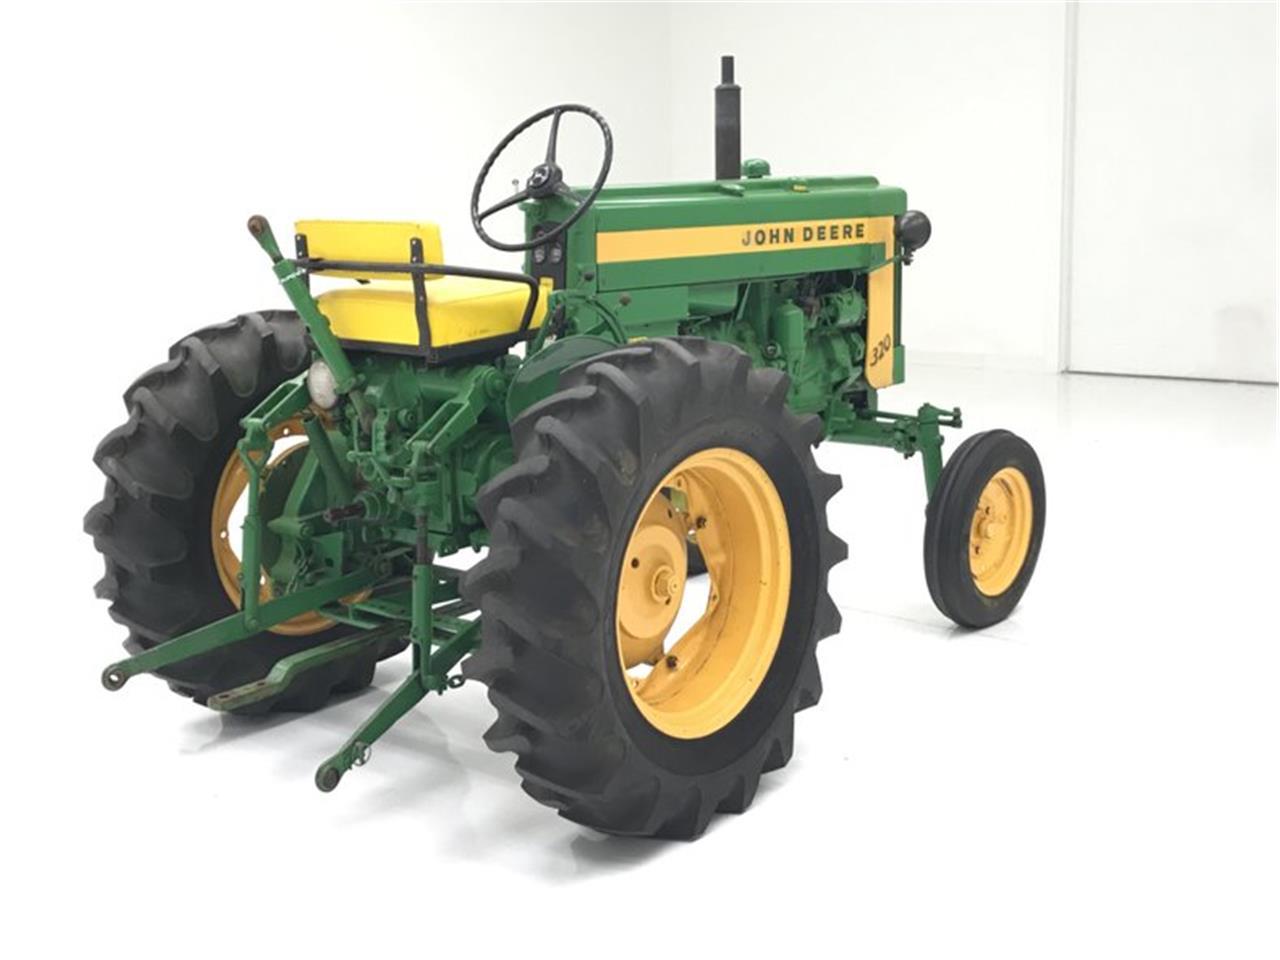 1958 John Deere Tractor (CC-1373689) for sale in Morgantown, Pennsylvania